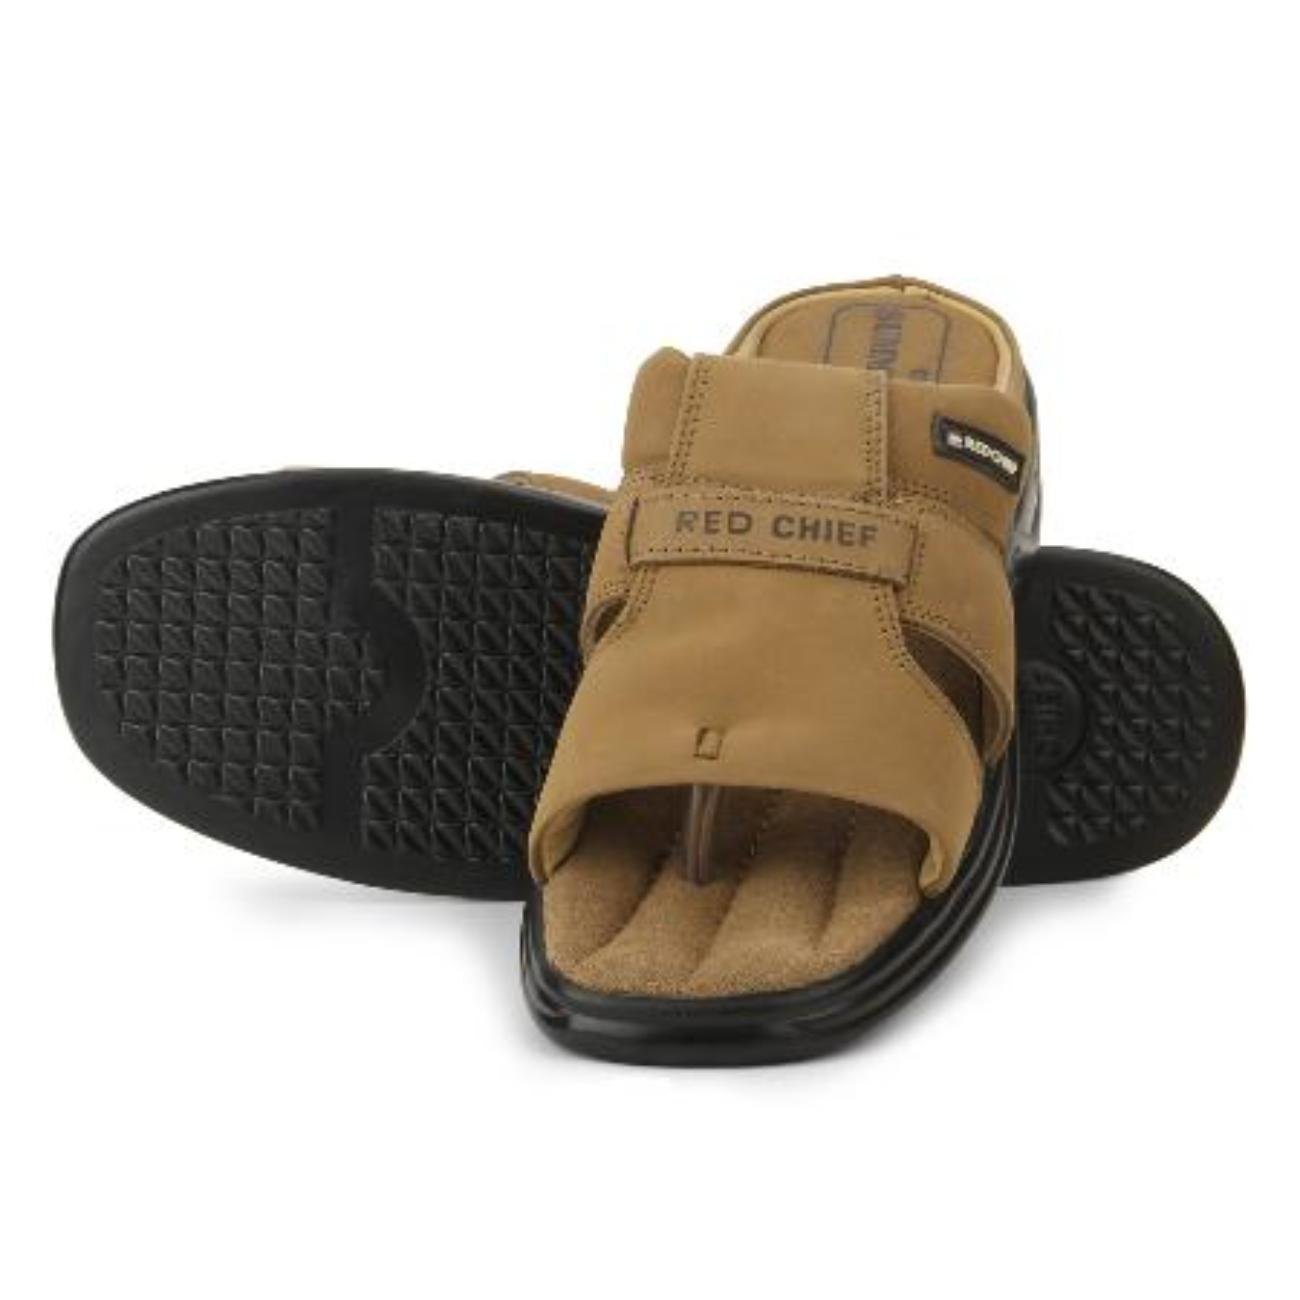 rust original slip-on slippers